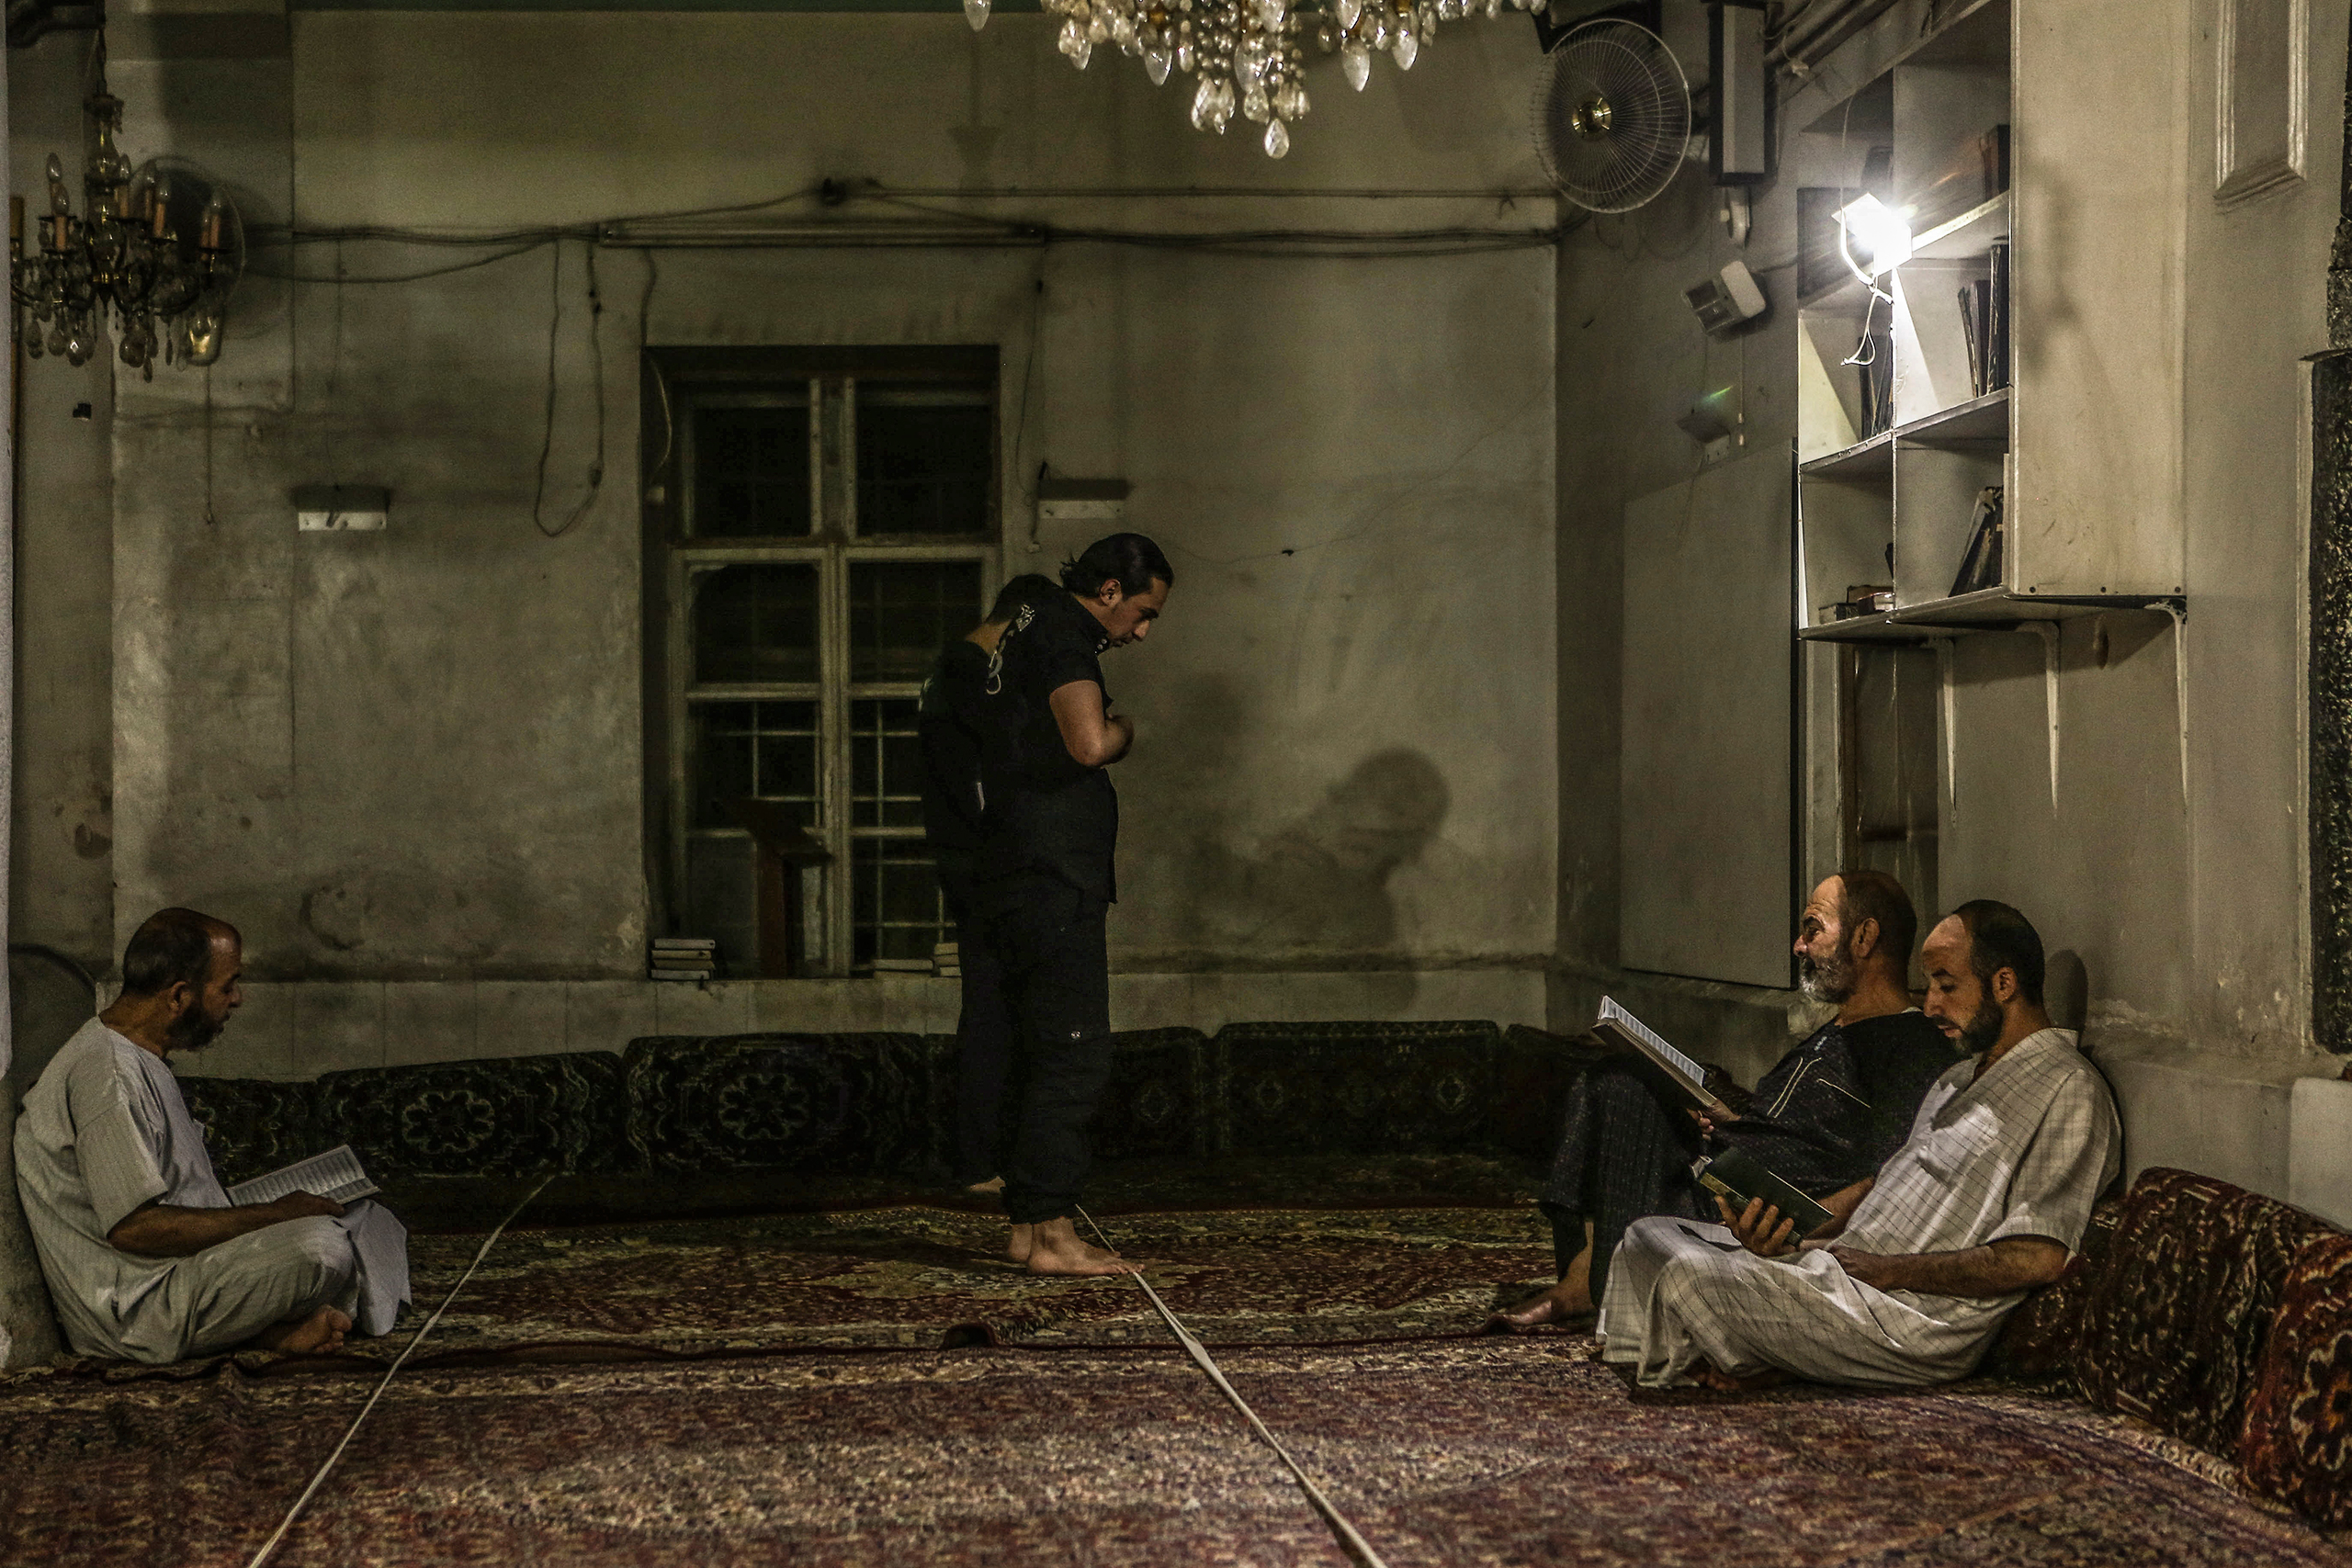 Men pray in a mosque in Eastern Ghouta province on July 2. Mohammed Badra—EPA